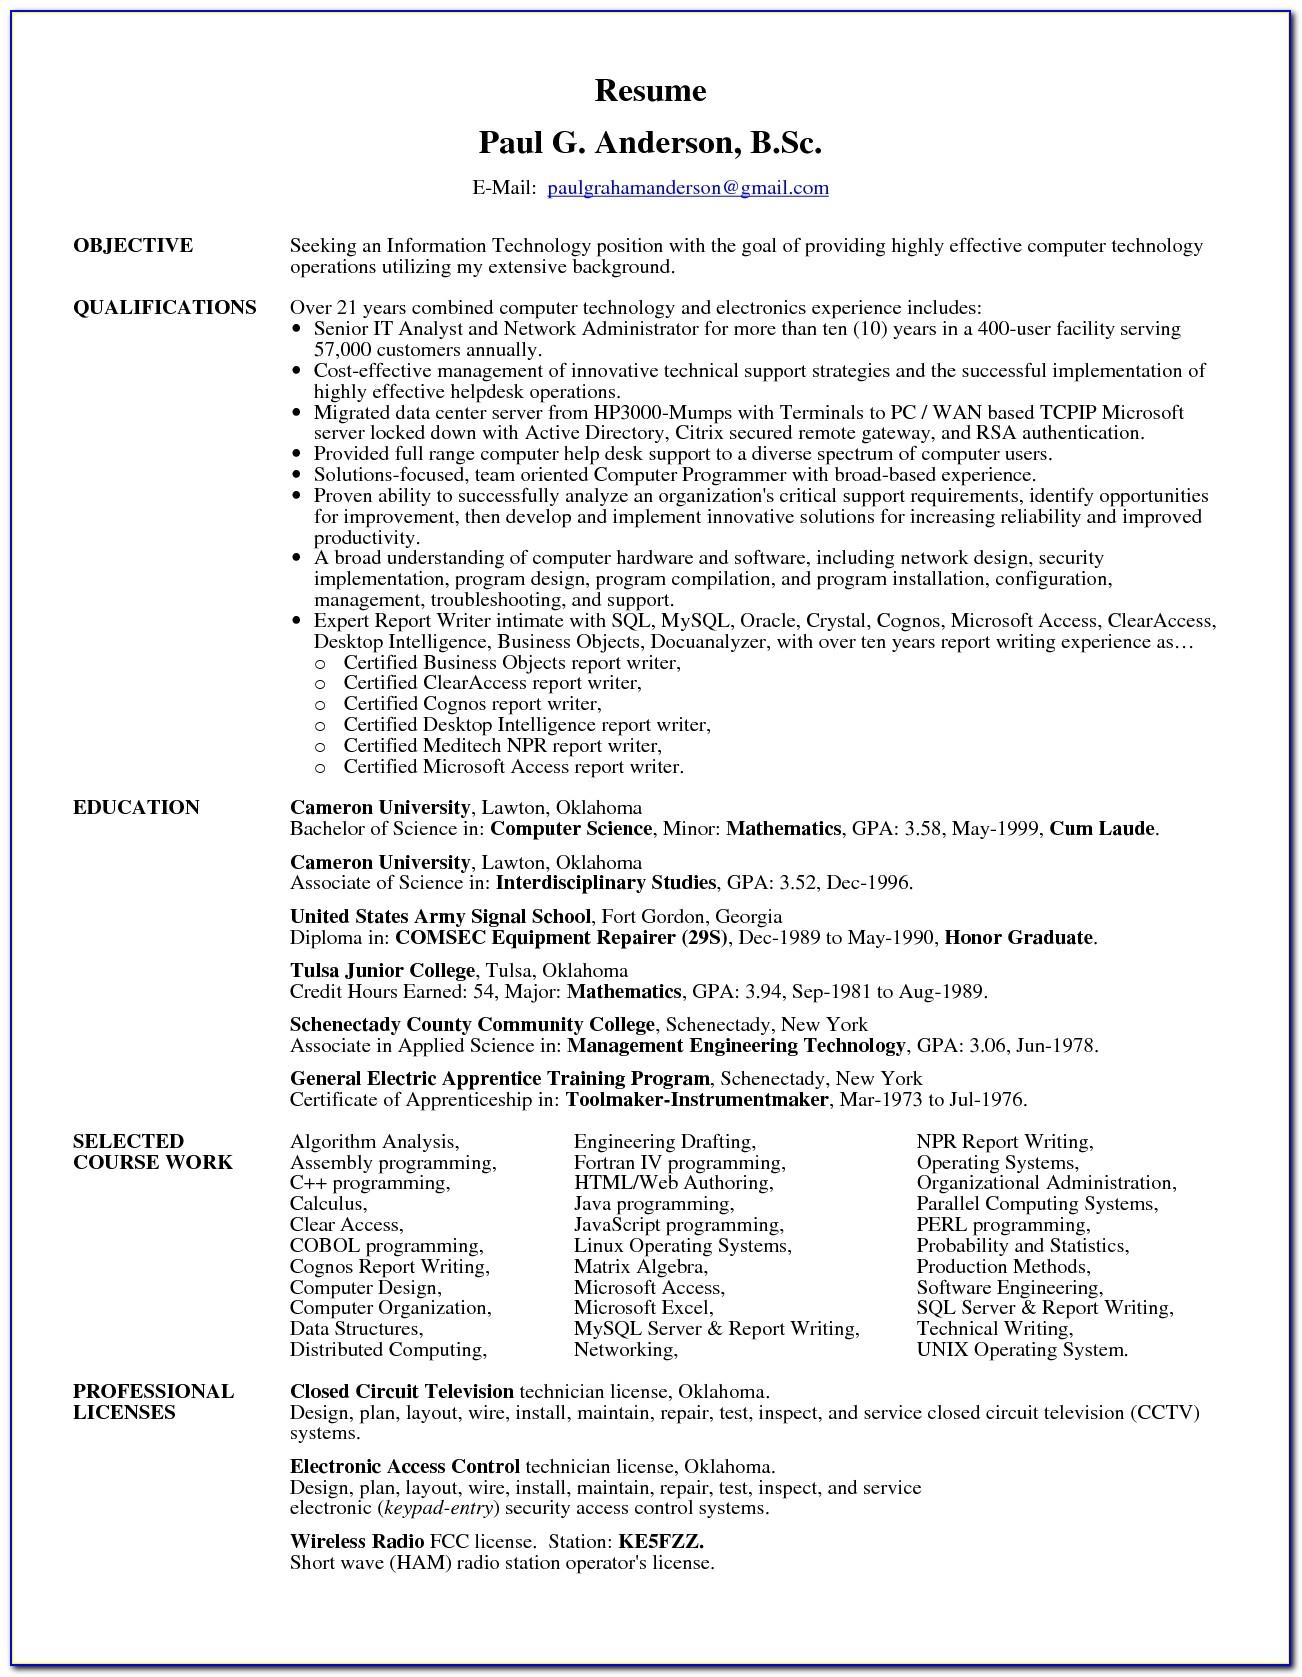 Certified Resume Writer   Resume Sample Format Throughout Professional Resume Writing Service